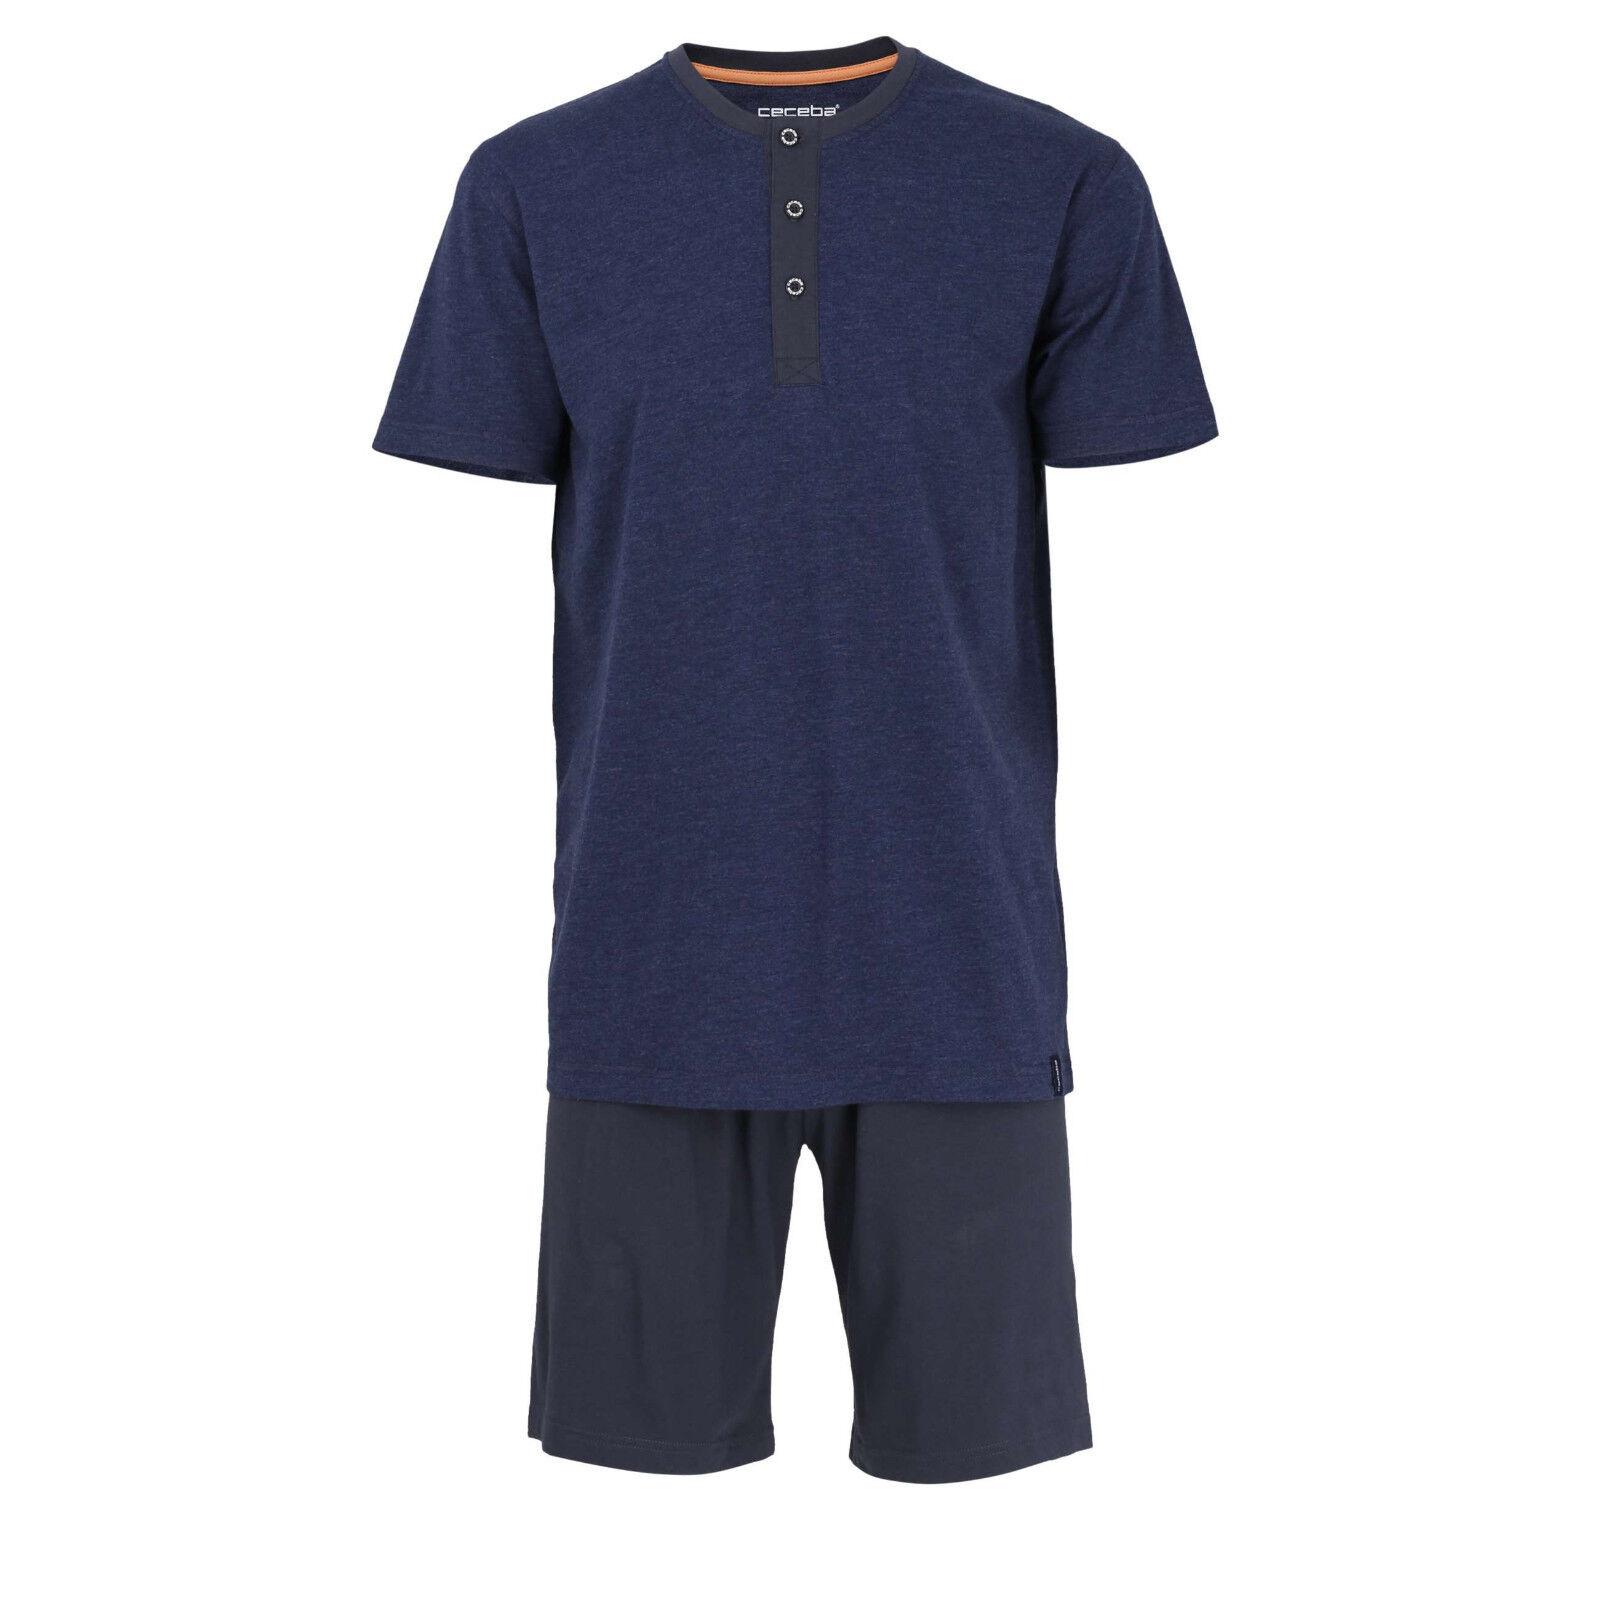 Ceceba Schlafanzug Größe S 48 Jersey-Pyjama blau blau blau Klima aktiv Knopfleiste | Haltbarer Service  23f293